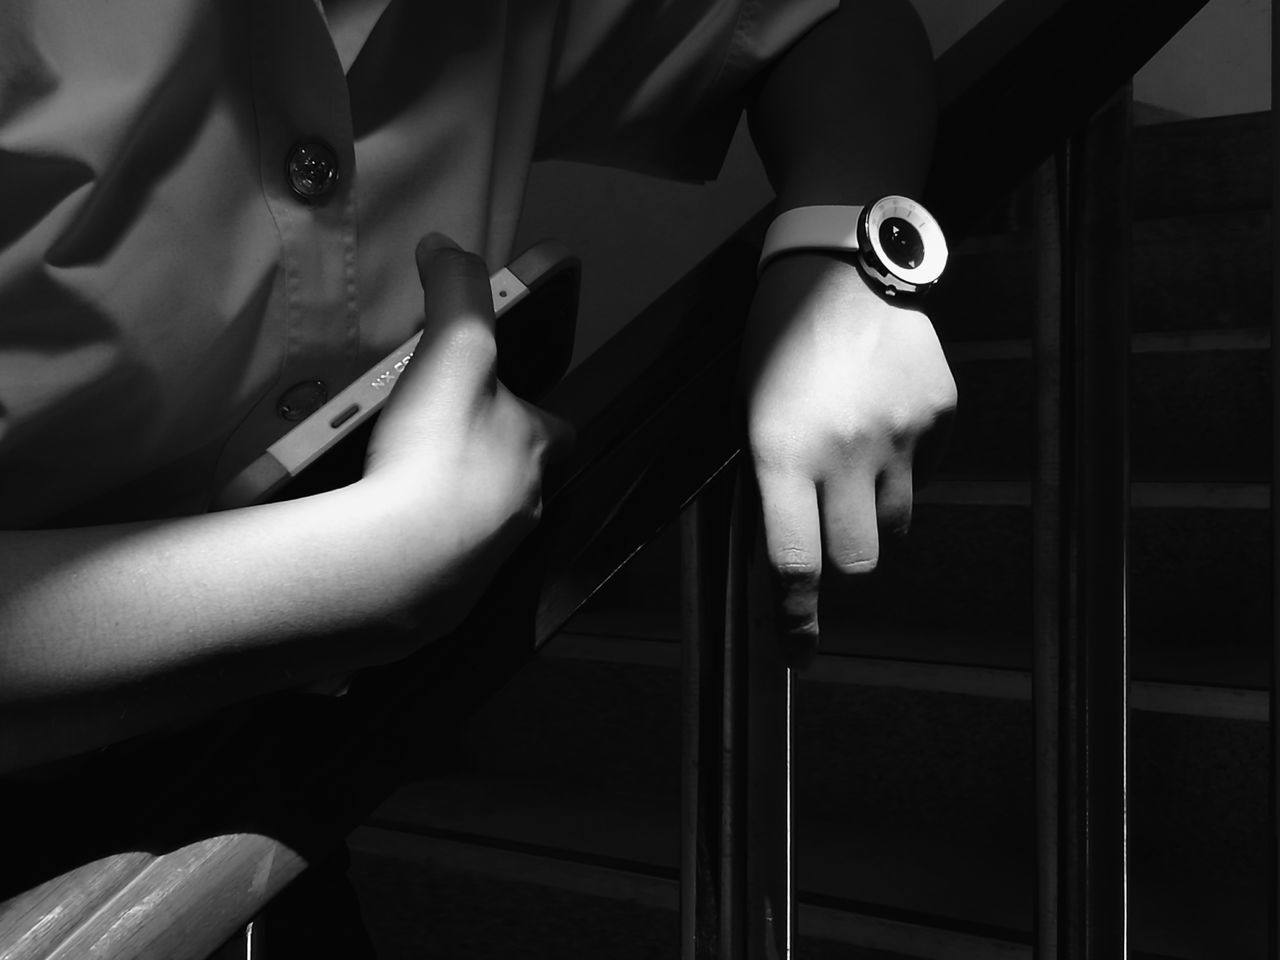 White and black Blackandwhite Shadow Sunlight Hand Wristwatch Wrist Watch Girl Structure LINE Bar EyeEmNewHere